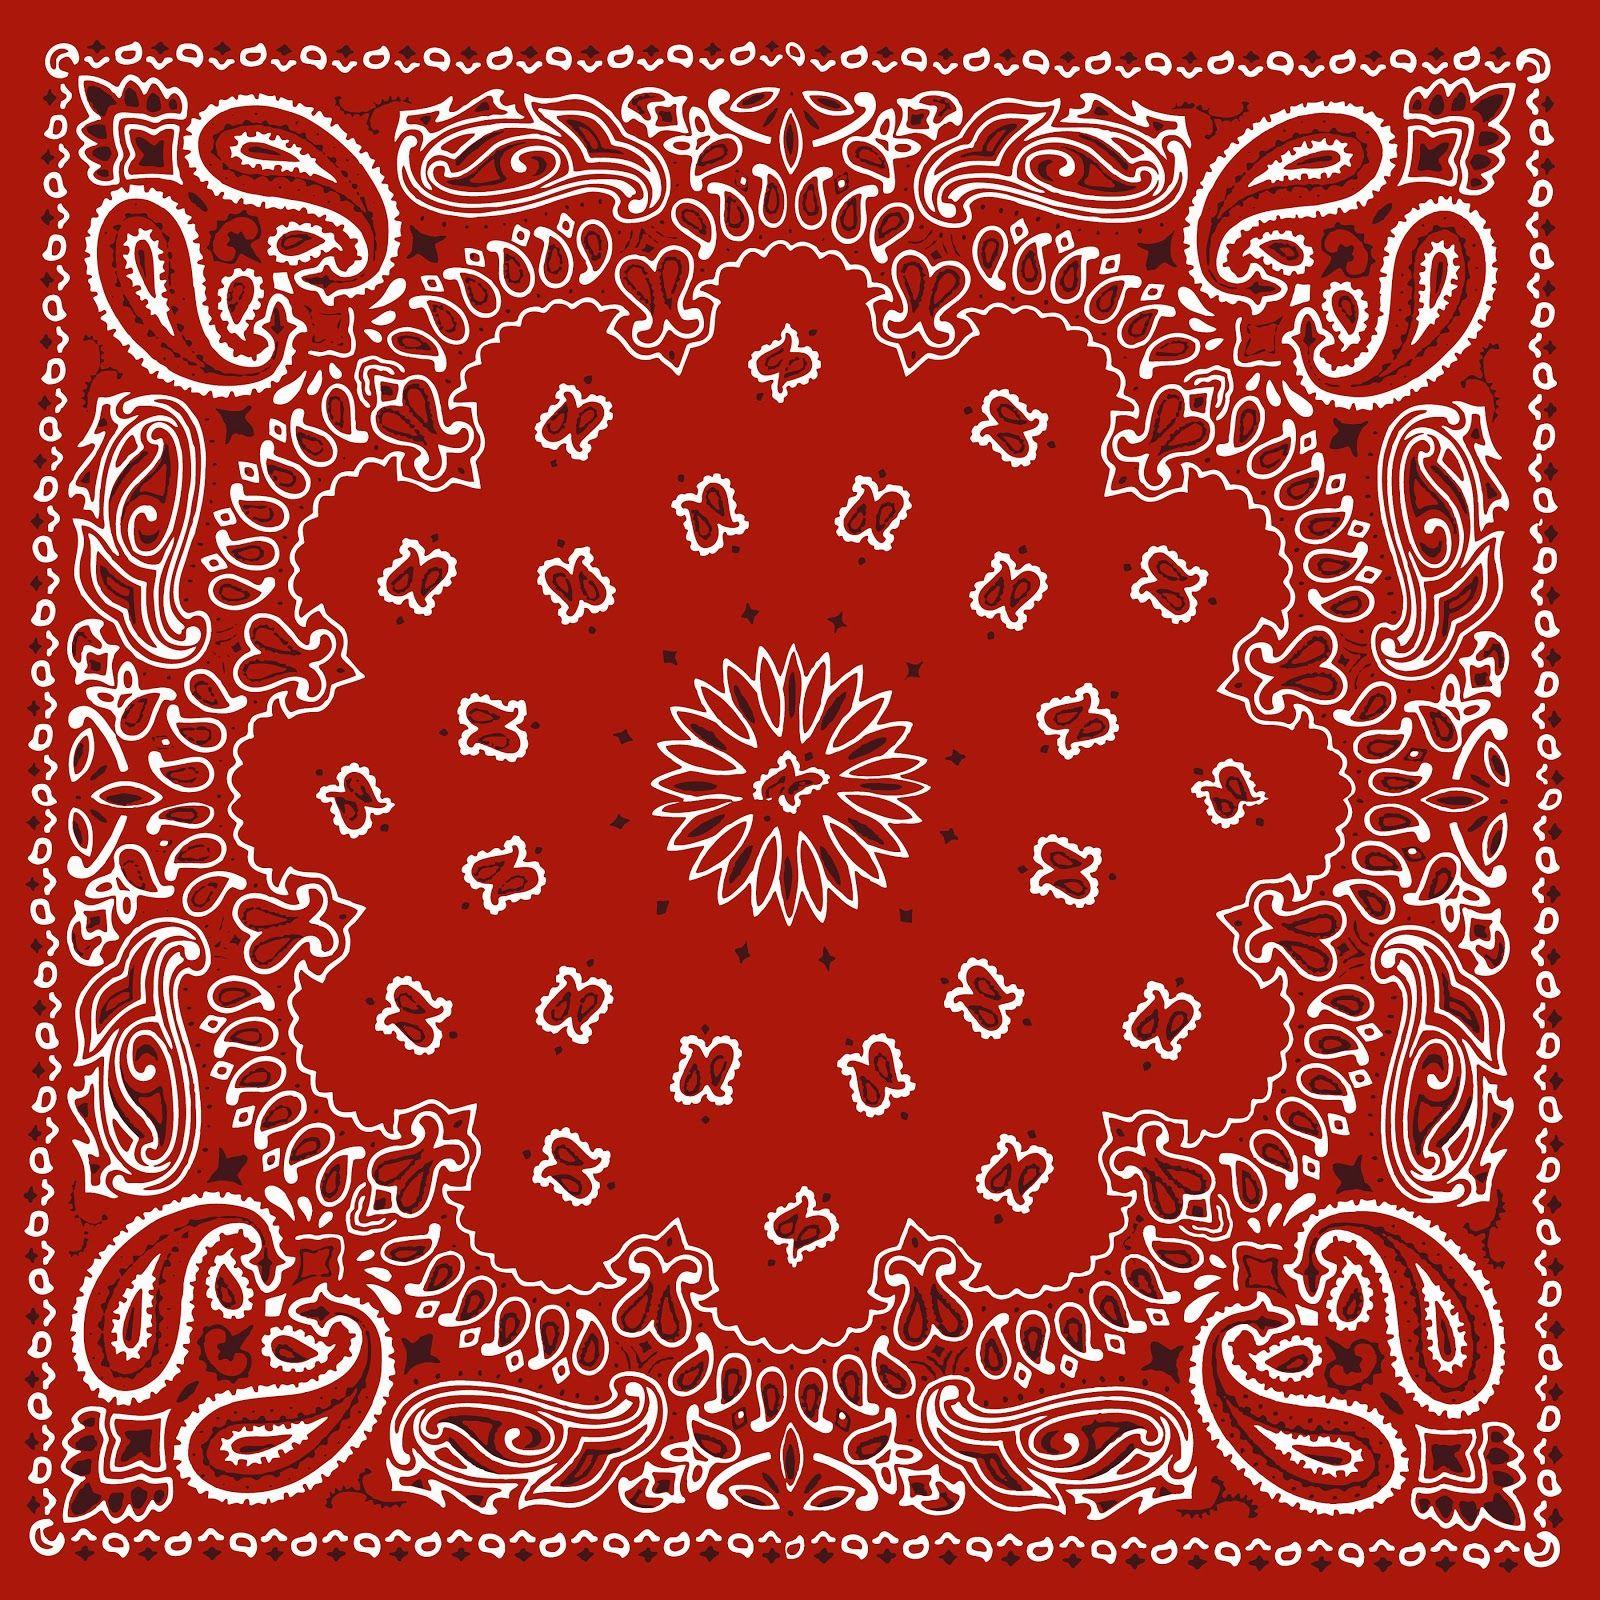 Printable Wallpaper: RED BANDANA, PRINTABLE BACKGROUND